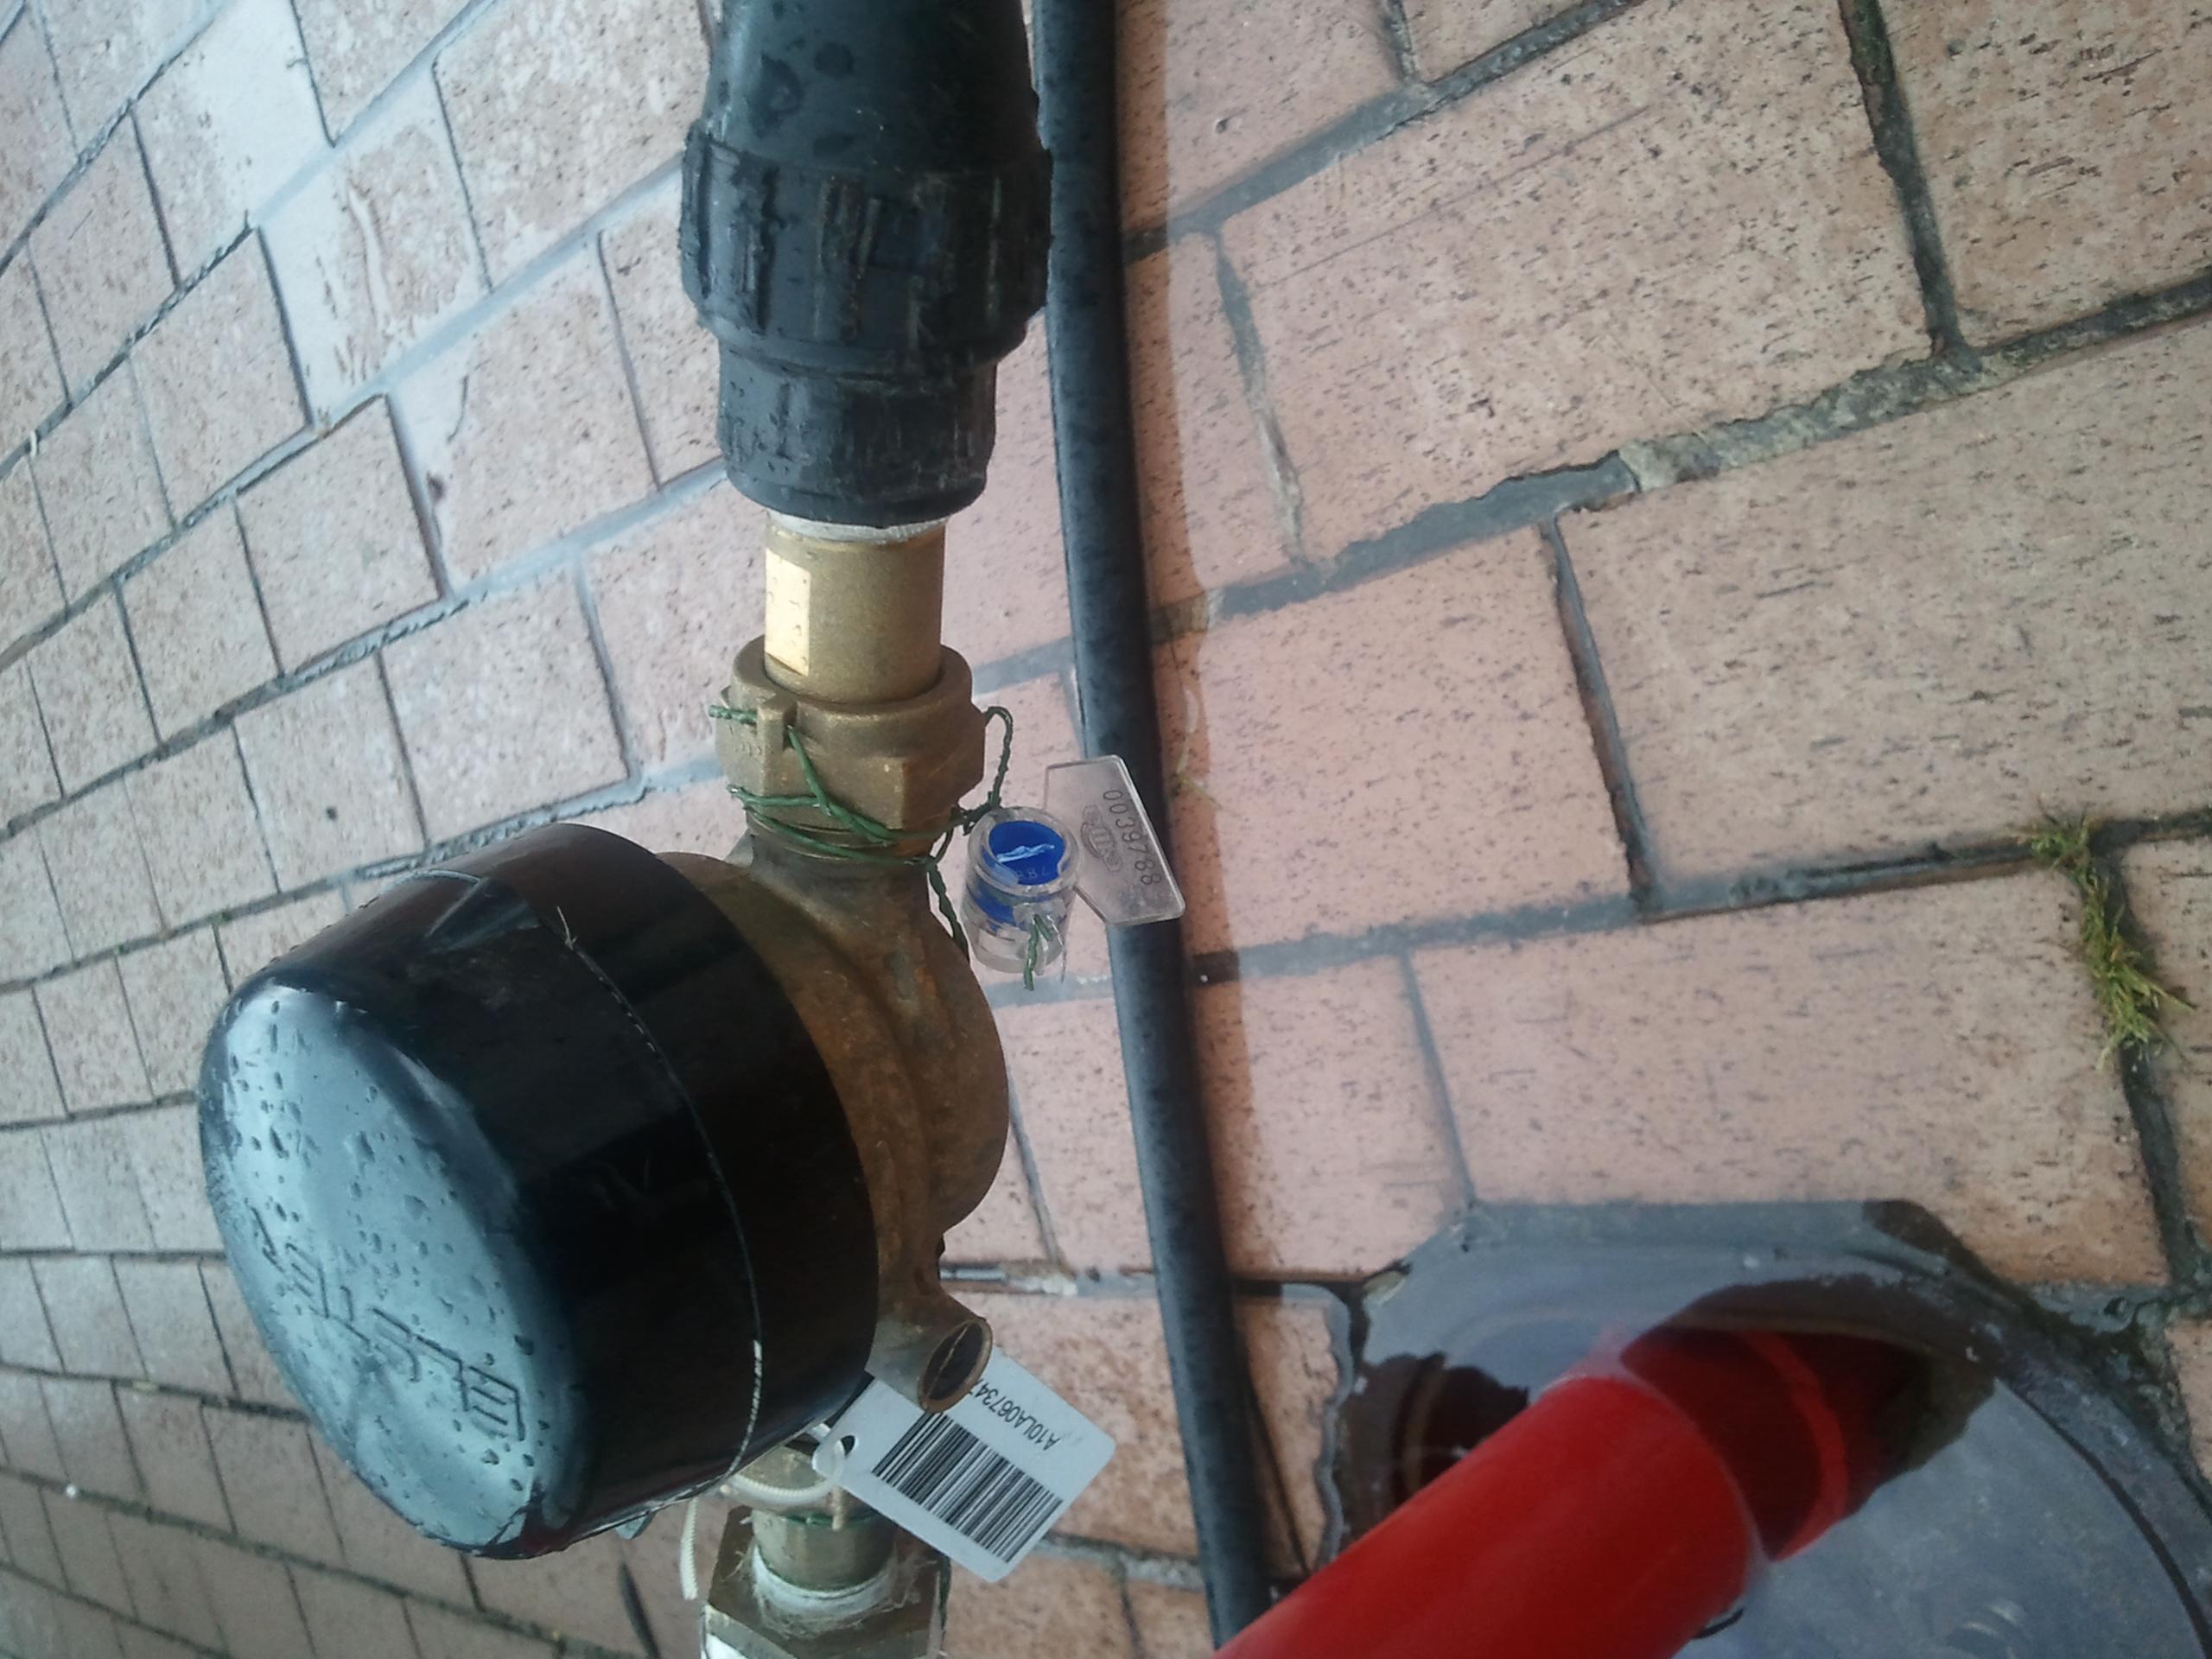 Precinto cierre rotativo Euro Tool Less  aplicado en contador agua